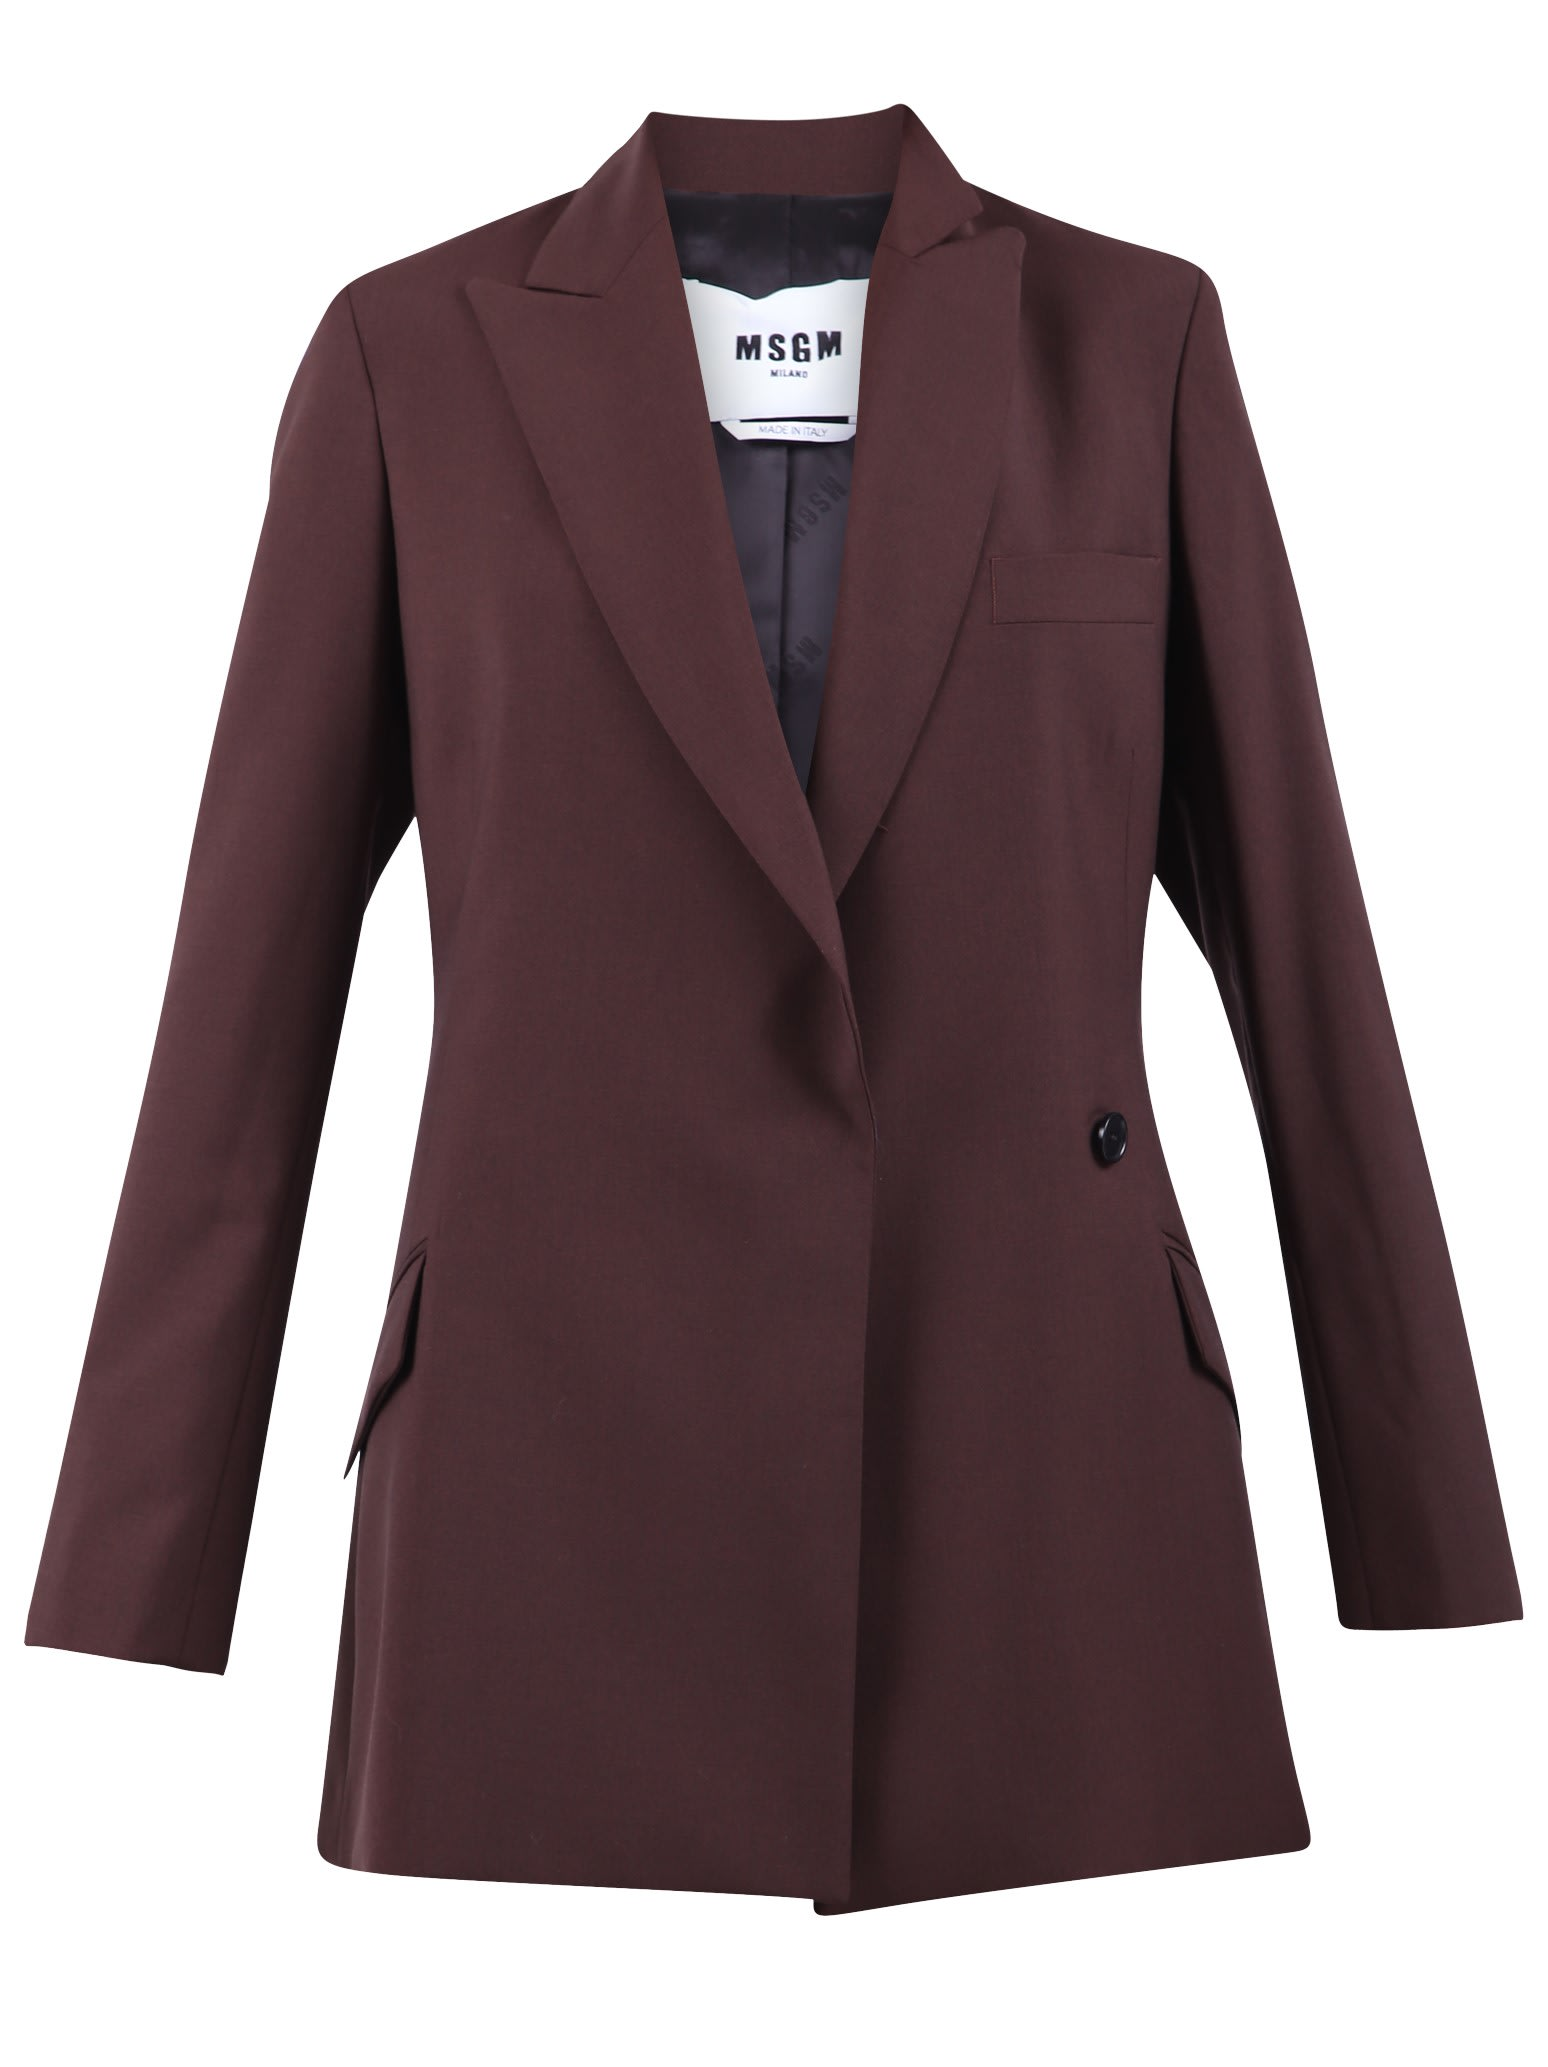 MSGM Brown Jacket